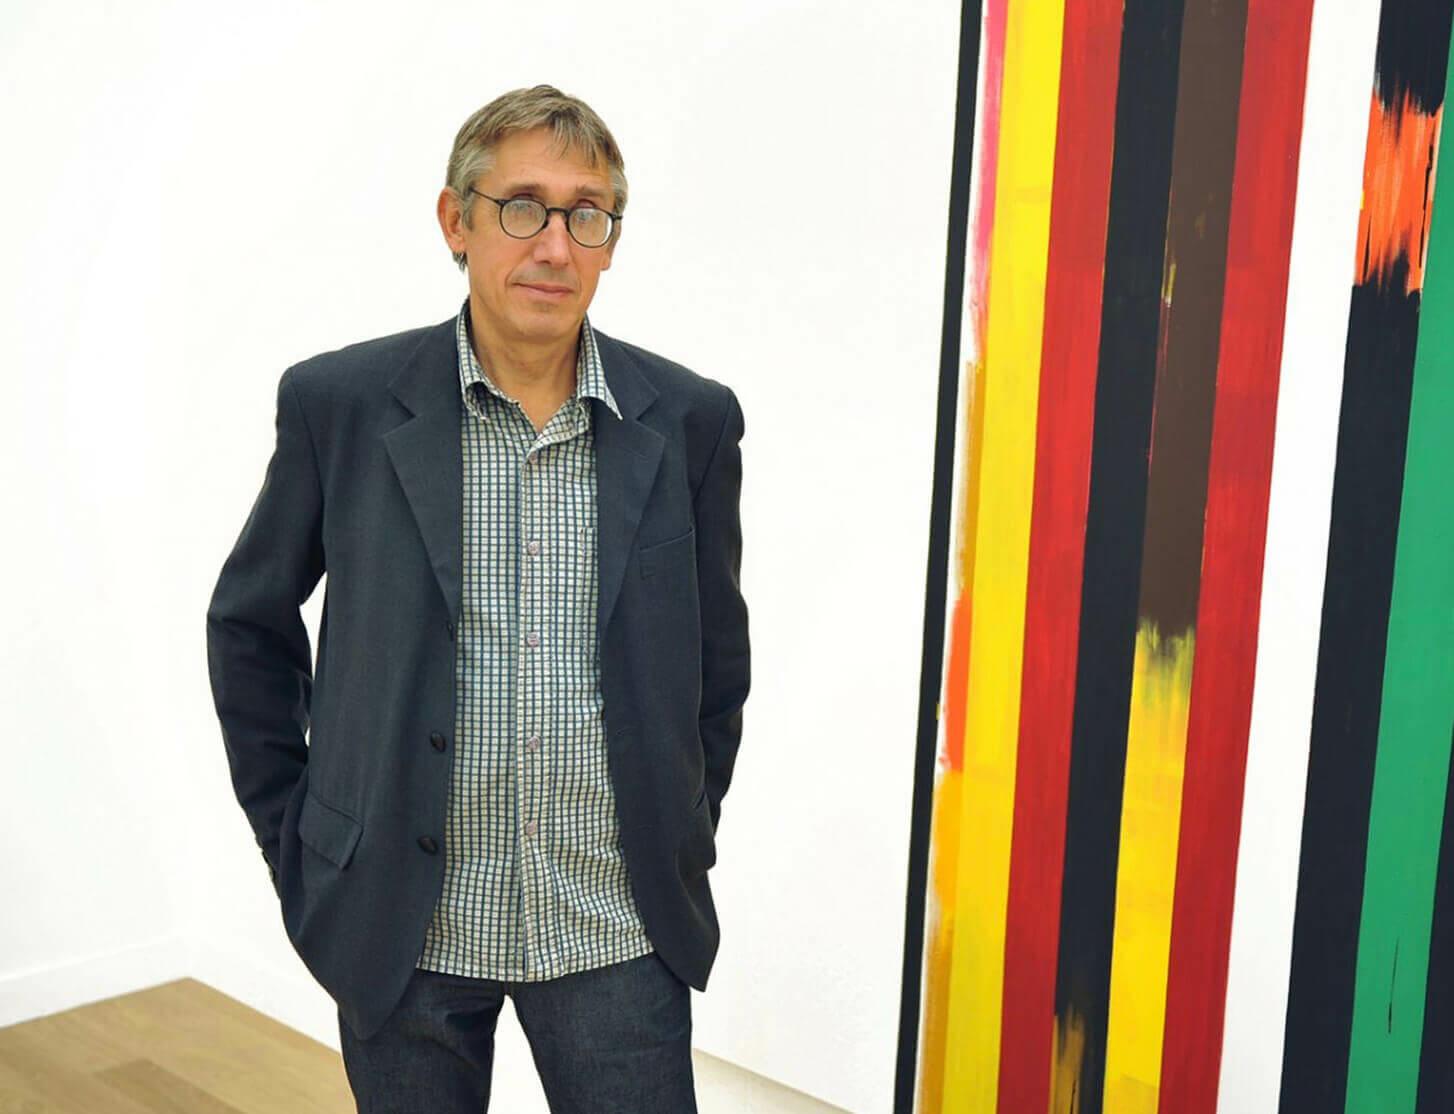 Announcing representation of Bernard Piffaretti